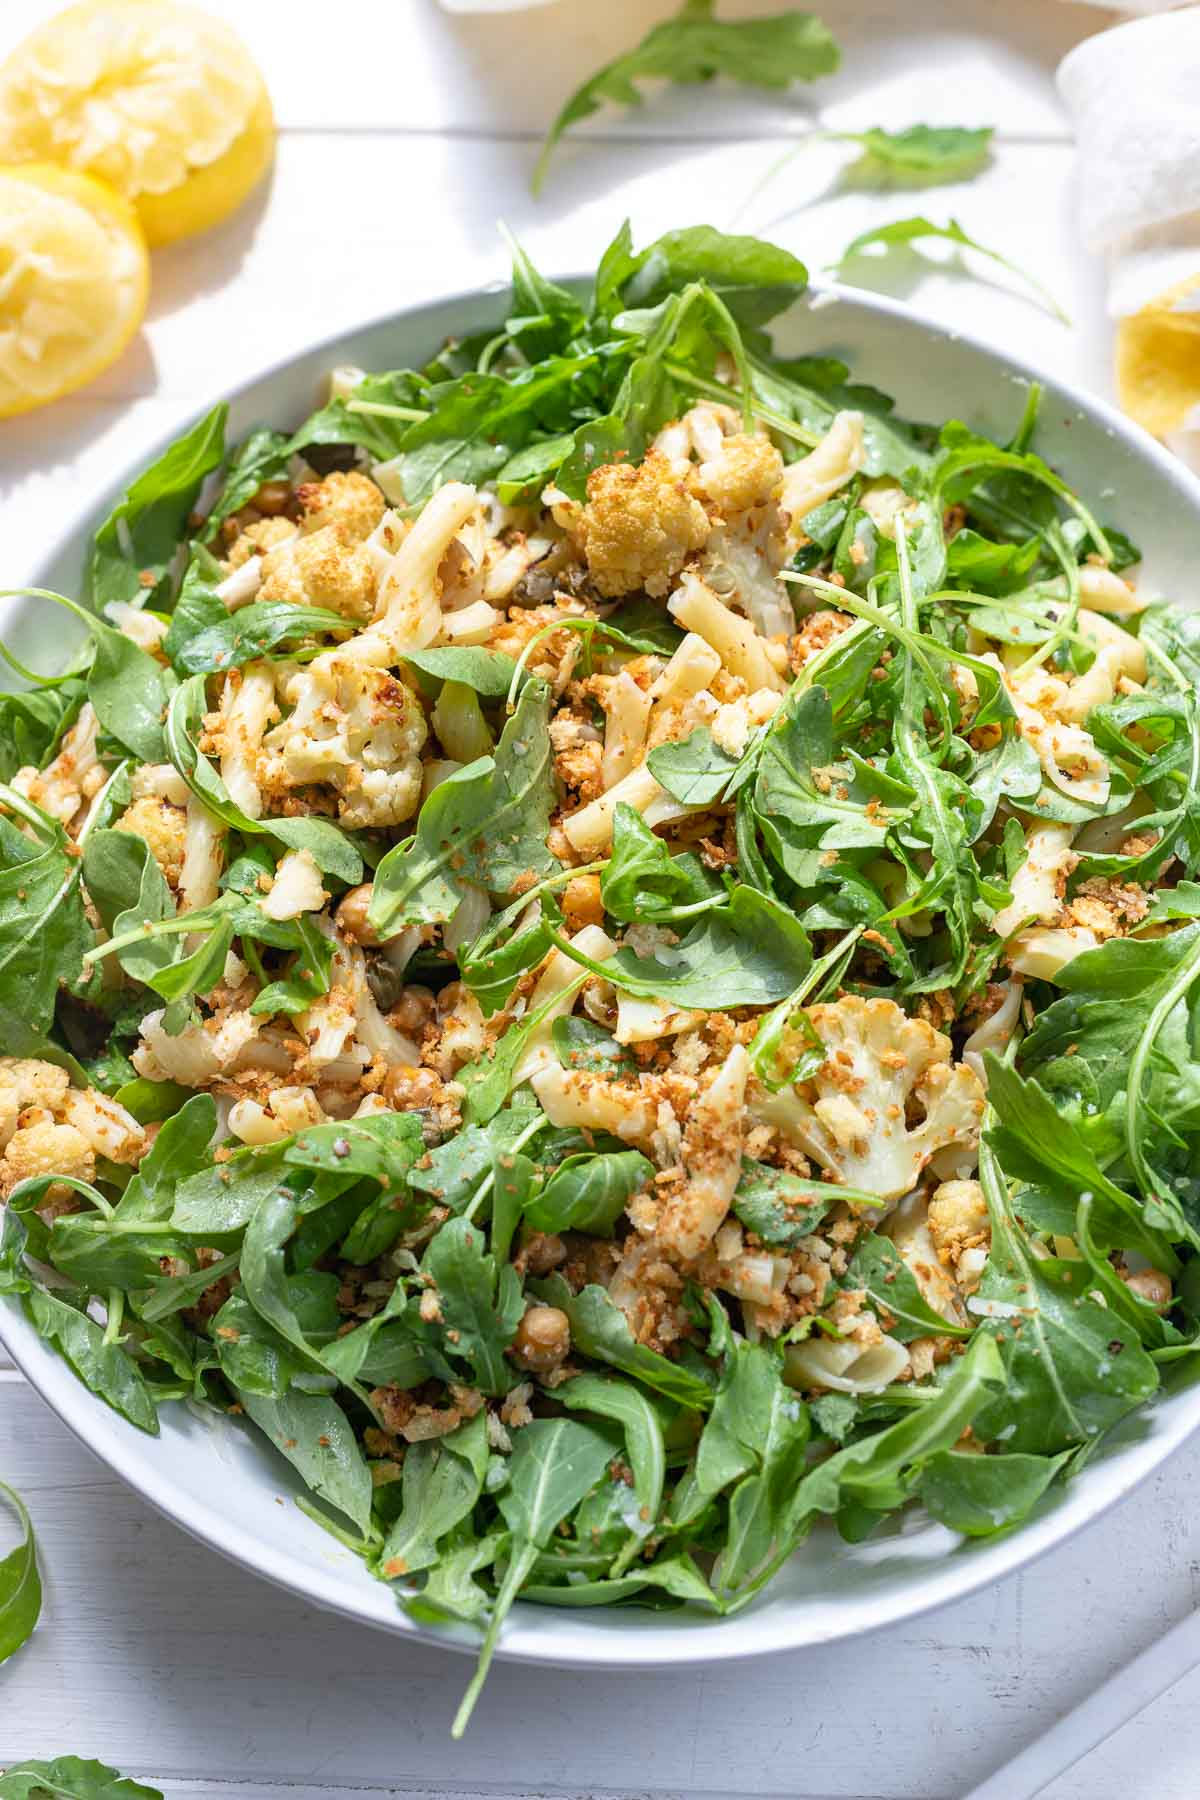 Roasted Cauliflower Pasta Salad with Chickpeas